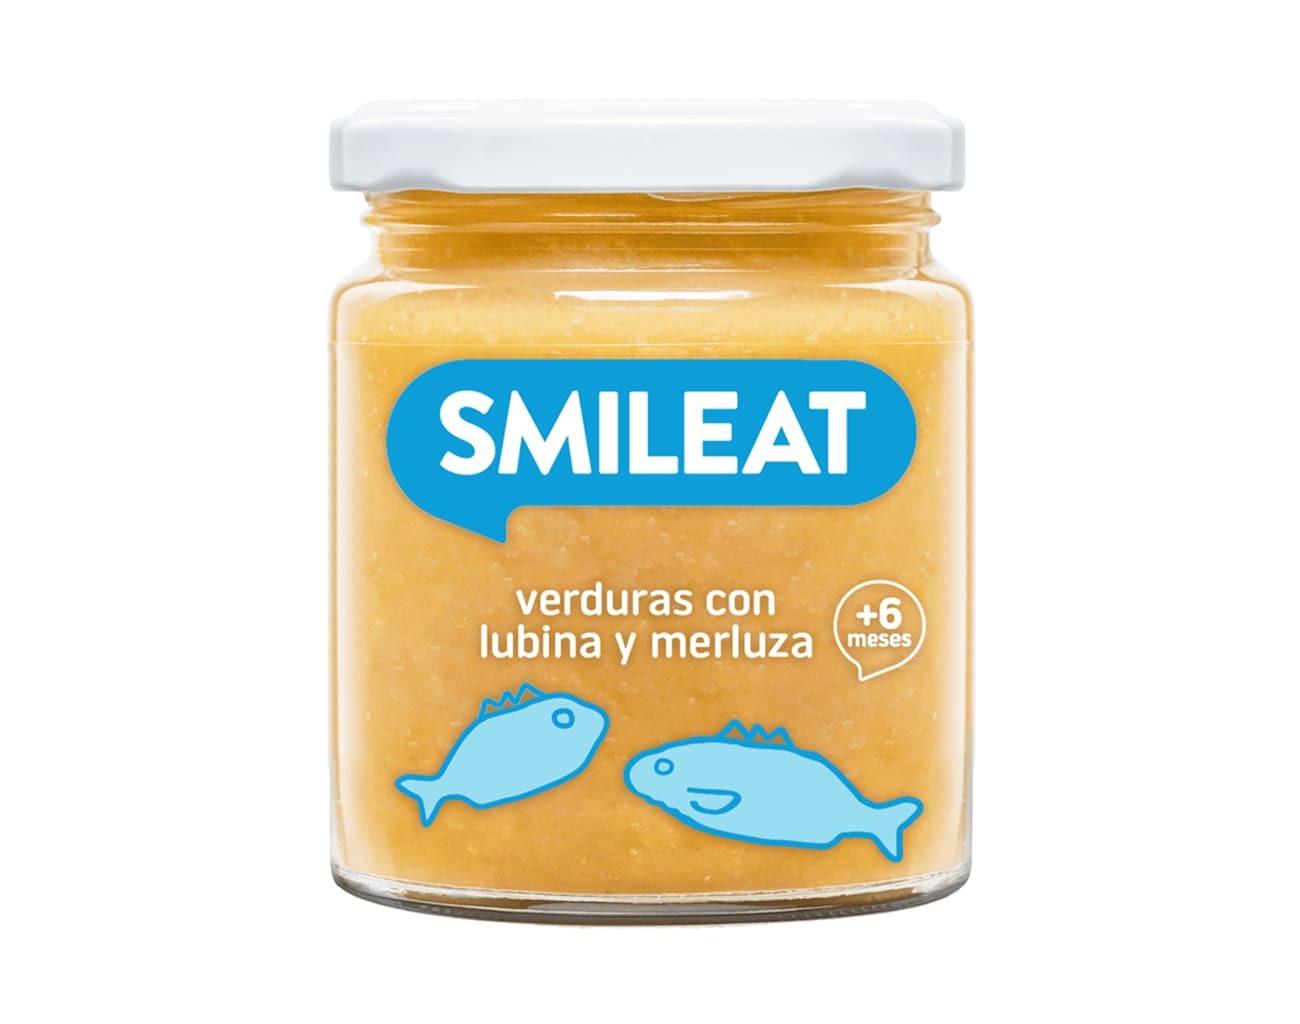 POTITO BIO VERDURAS LUBINA MERLUZA  230 G ( y 8MESES) SMILEAT en Biovegalia